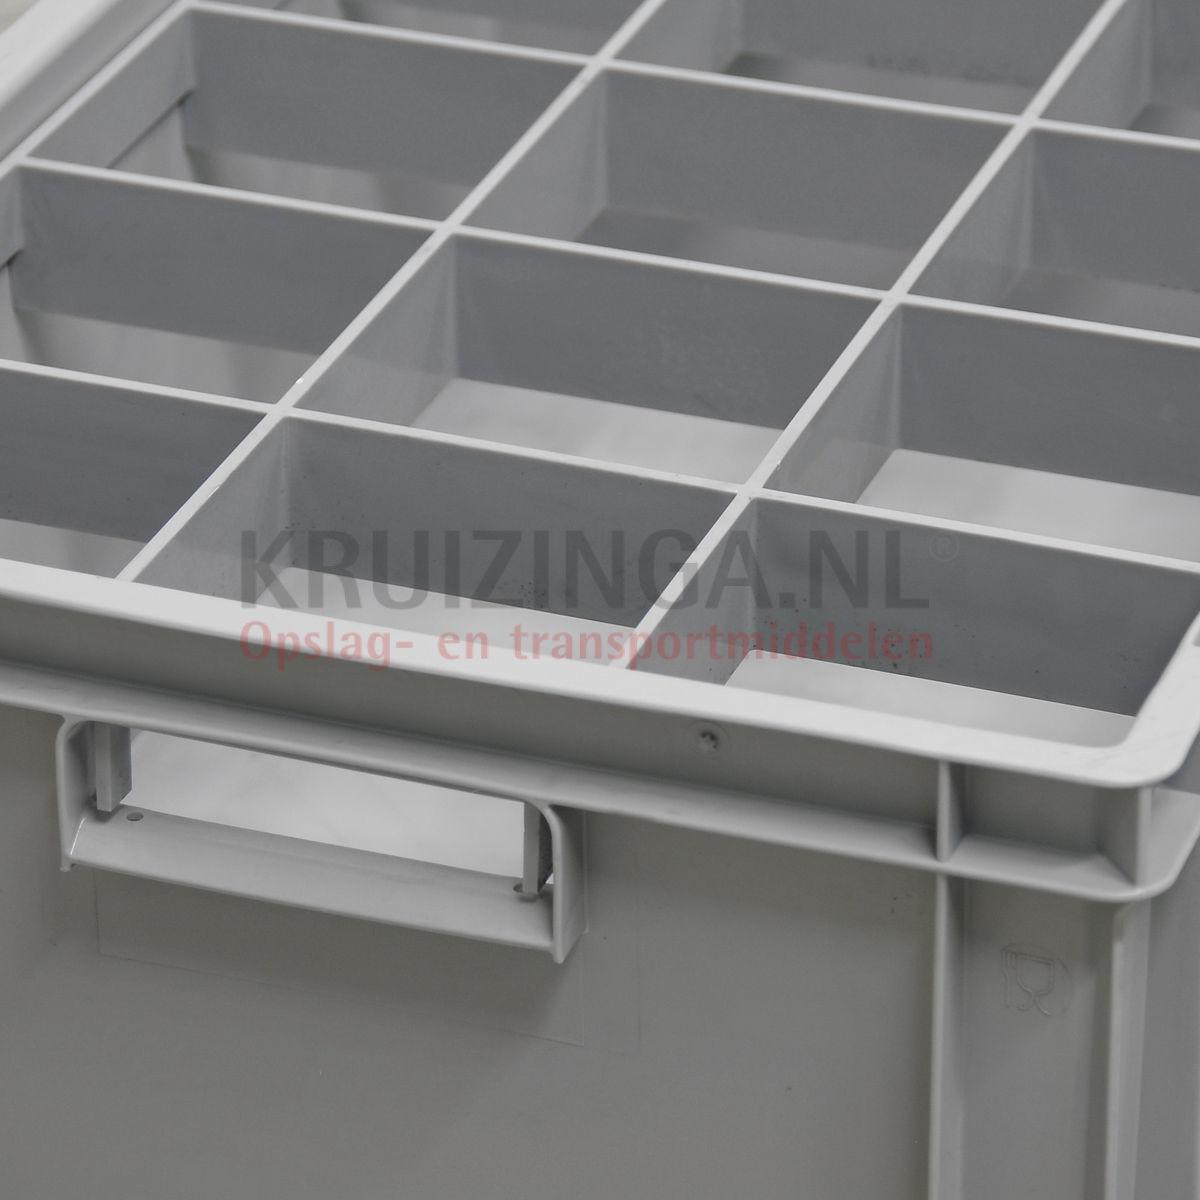 stapelboxen kunststoff zubeh r eins tze f r gl ser. Black Bedroom Furniture Sets. Home Design Ideas